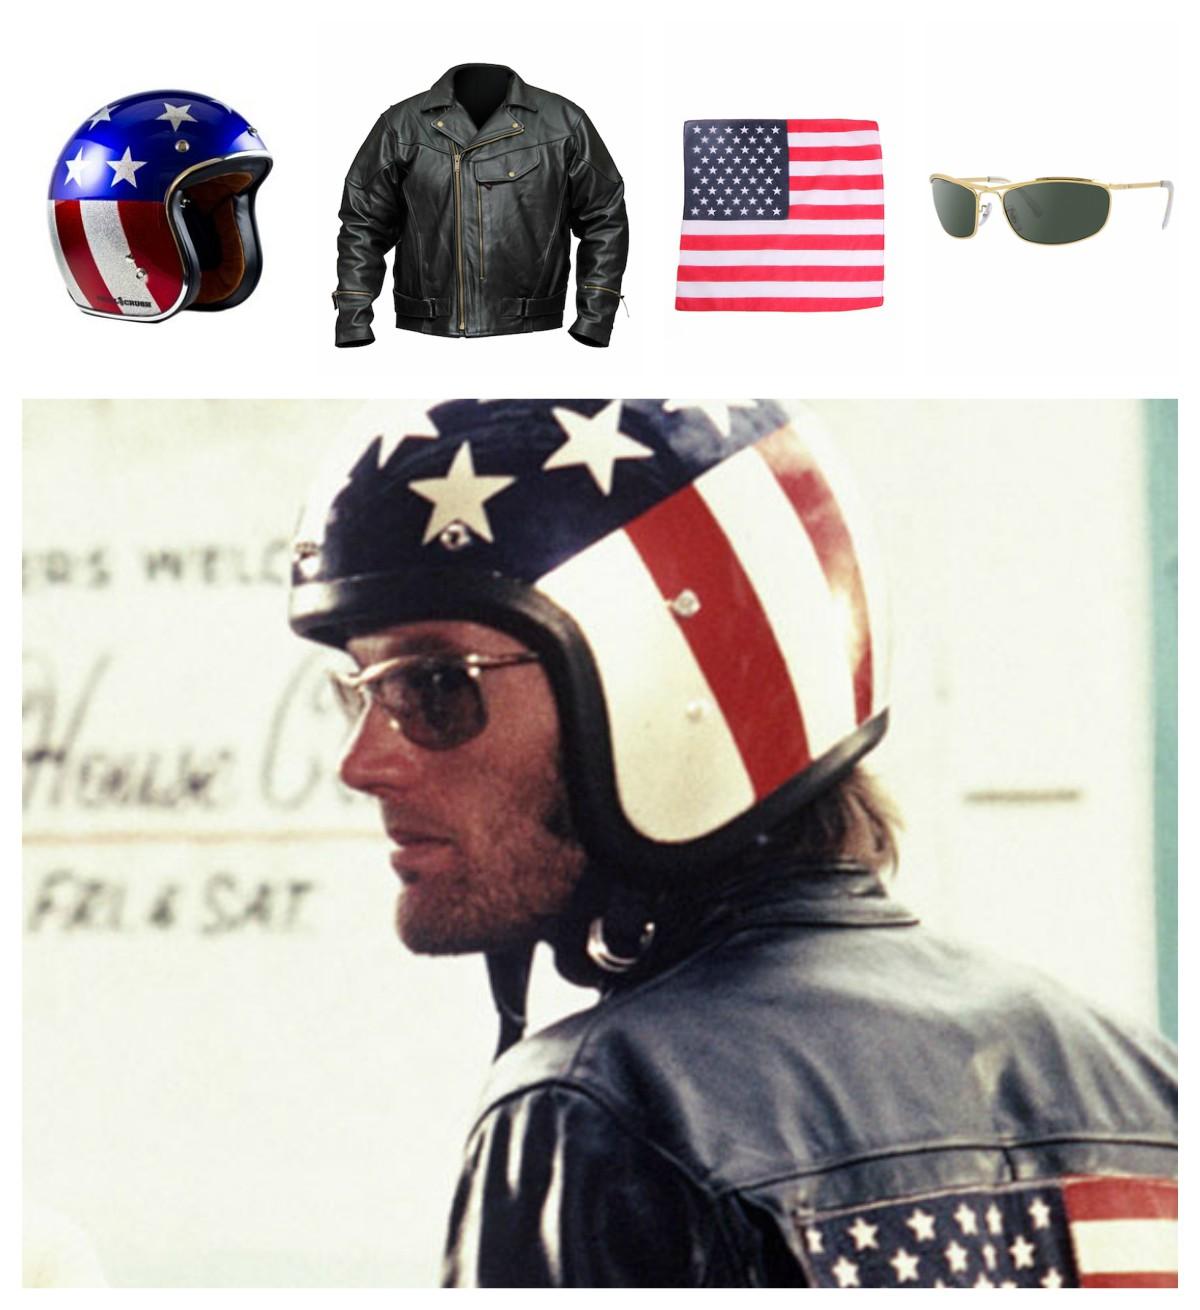 easy-rider-costume